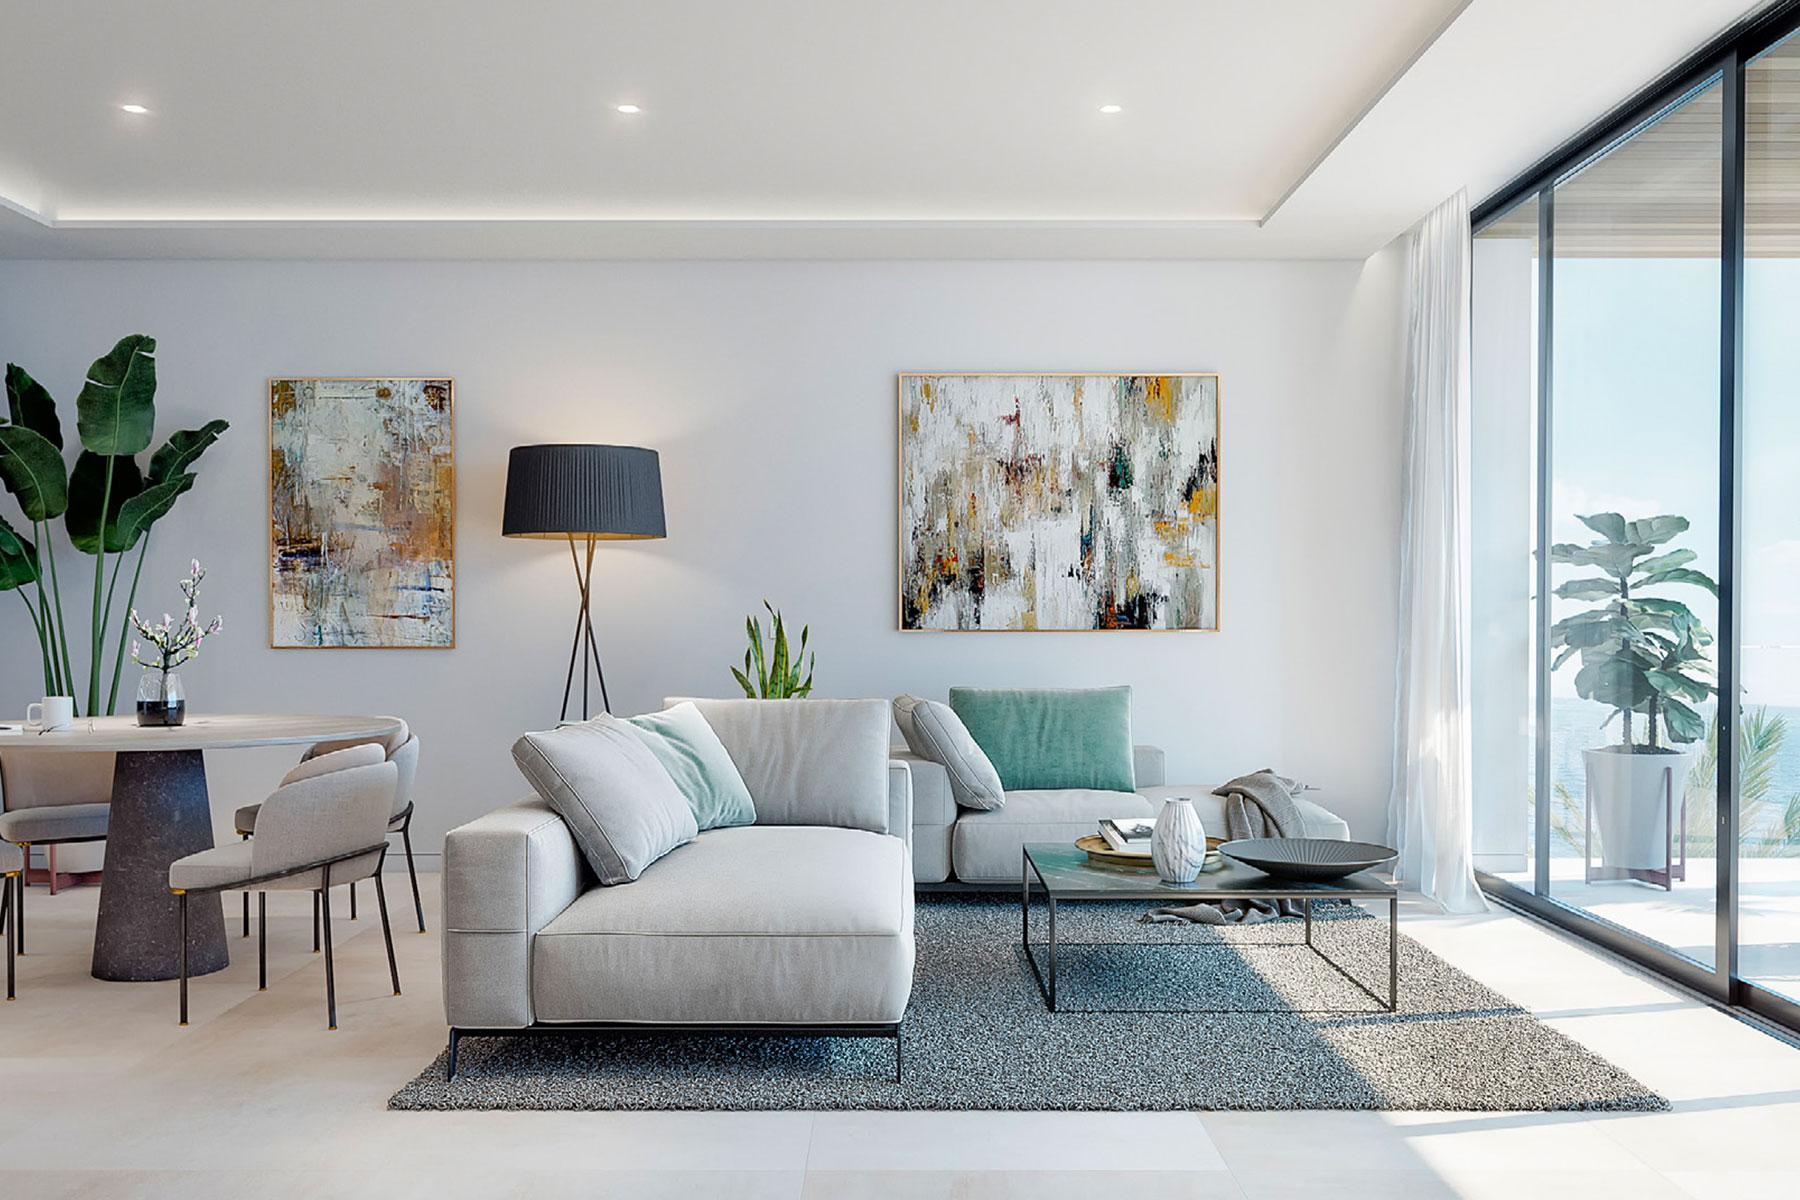 Jade Tower Property Investment Costa Del Sol Spain Fuengirola